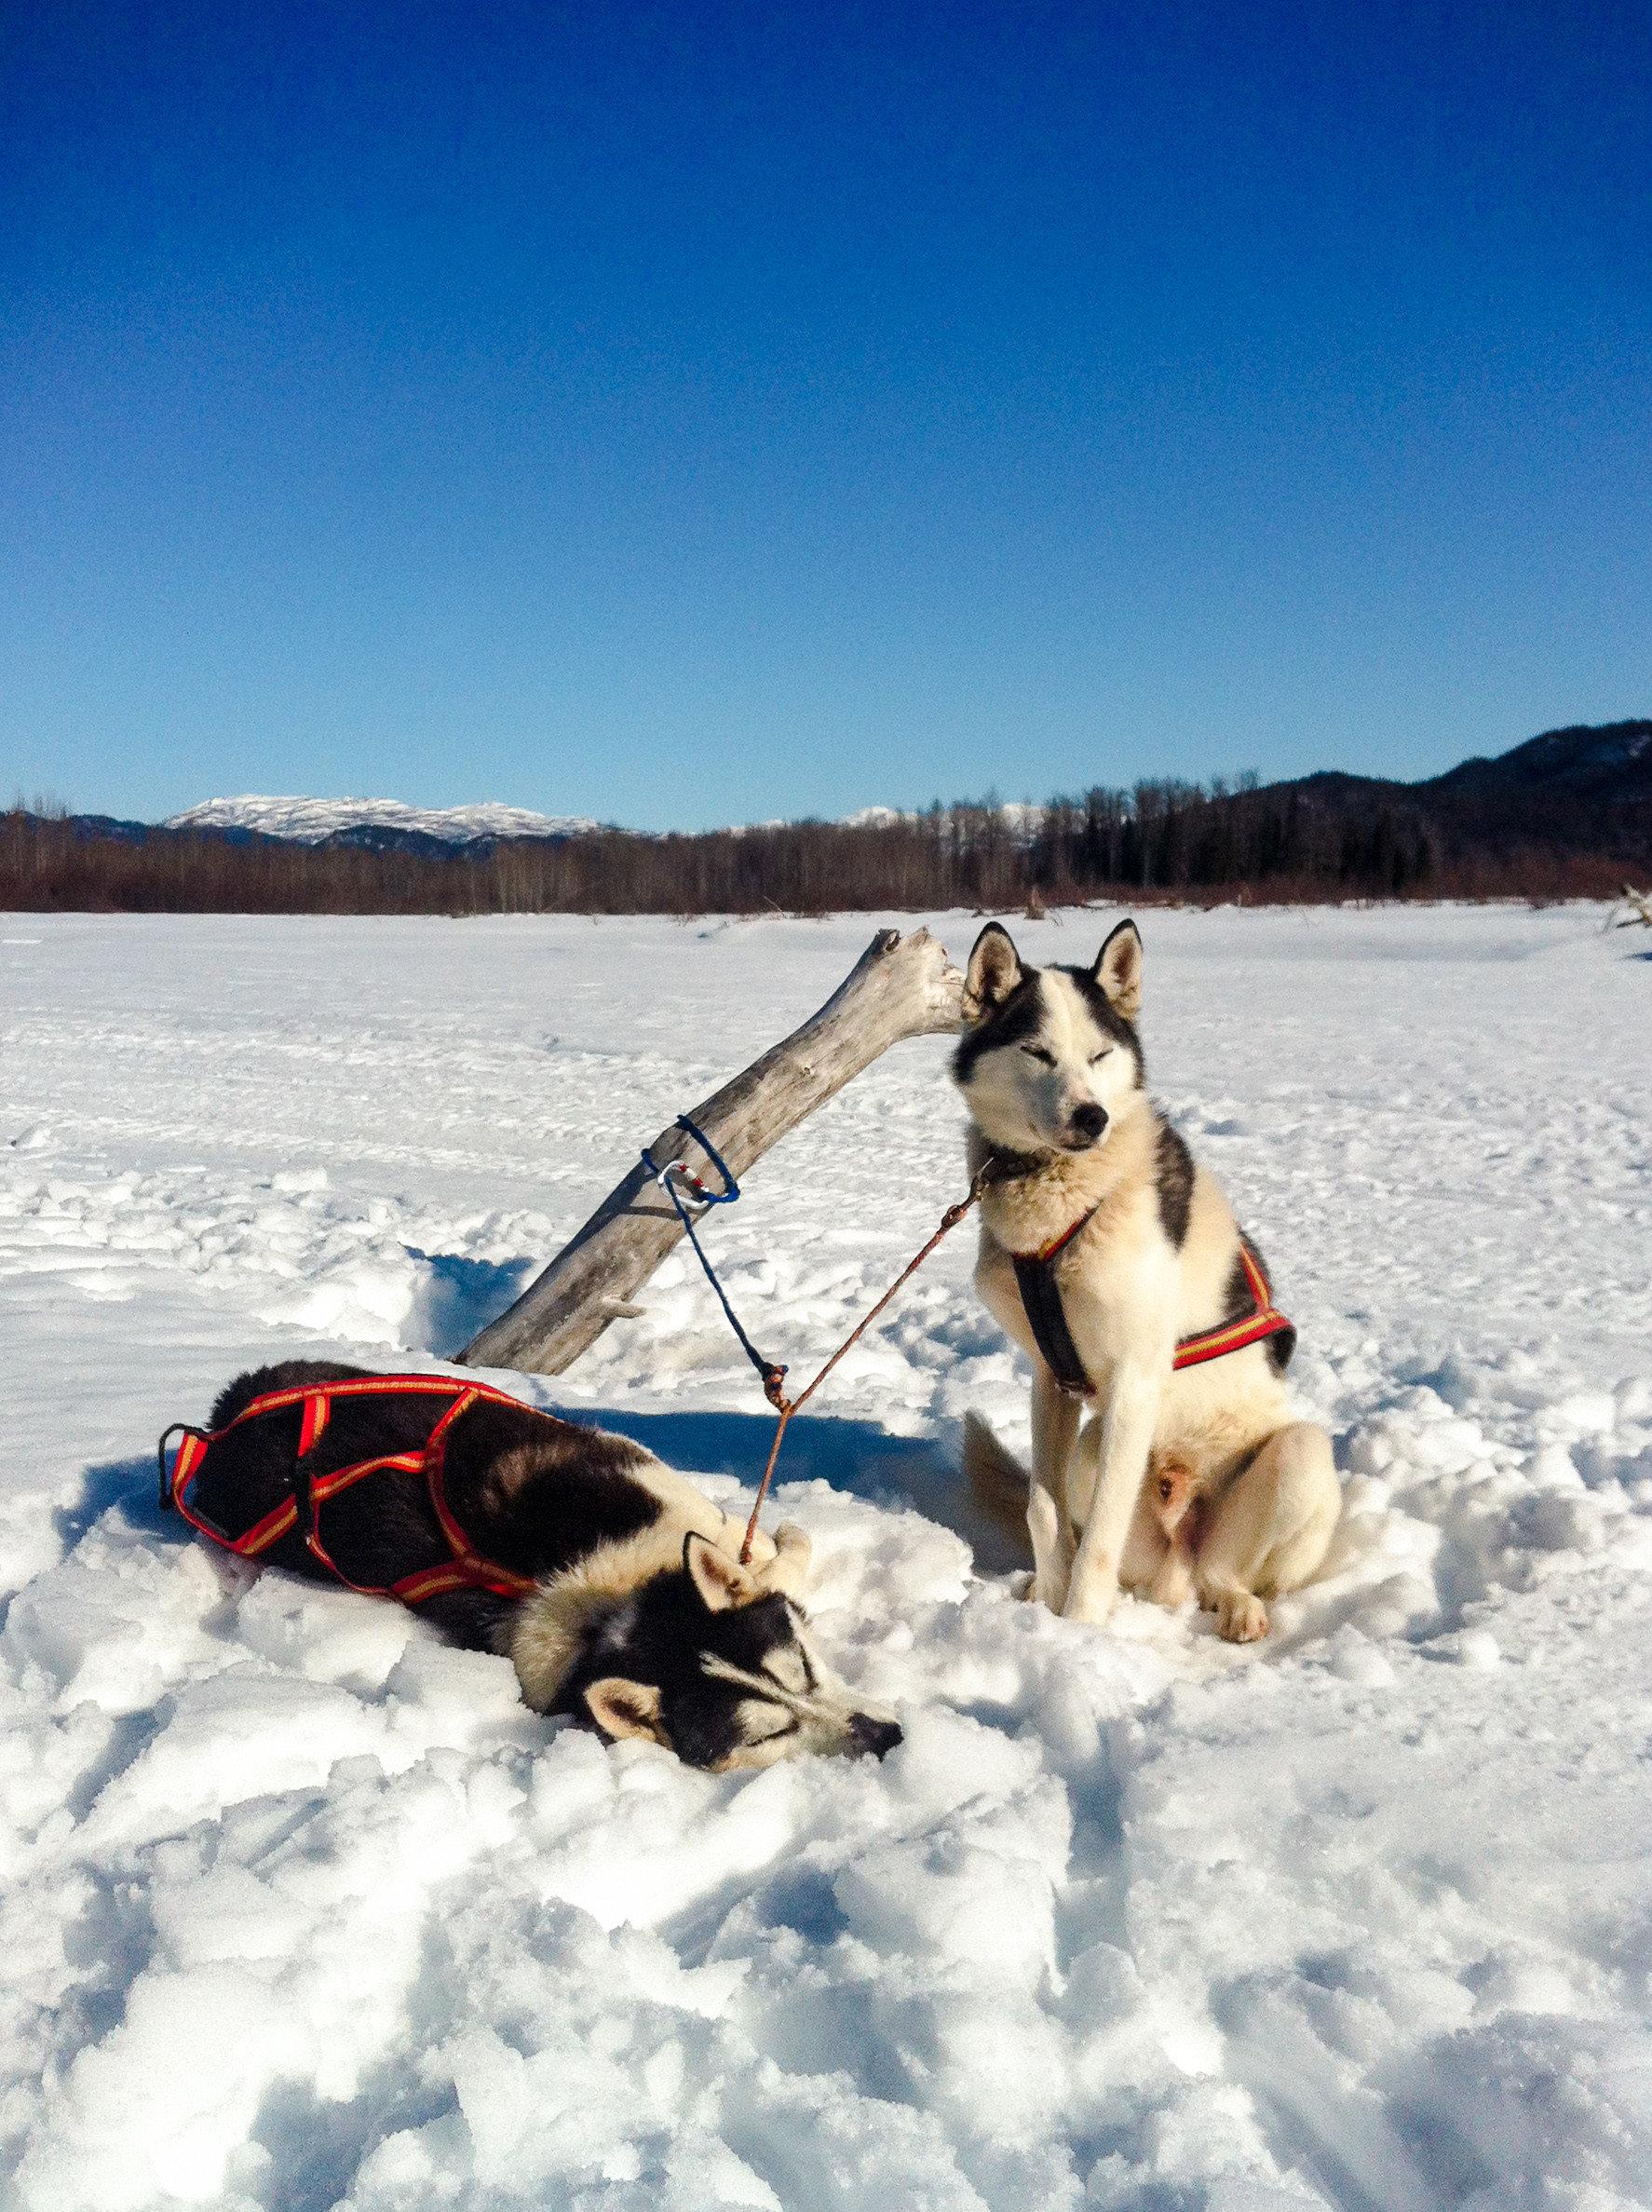 snow Dog dog like mammal Winter arctic sled dog racing mushing sky vacation ice leash sled dog siberian husky freezing Adventure glacial landform fun dog sled greenland dog dog breed